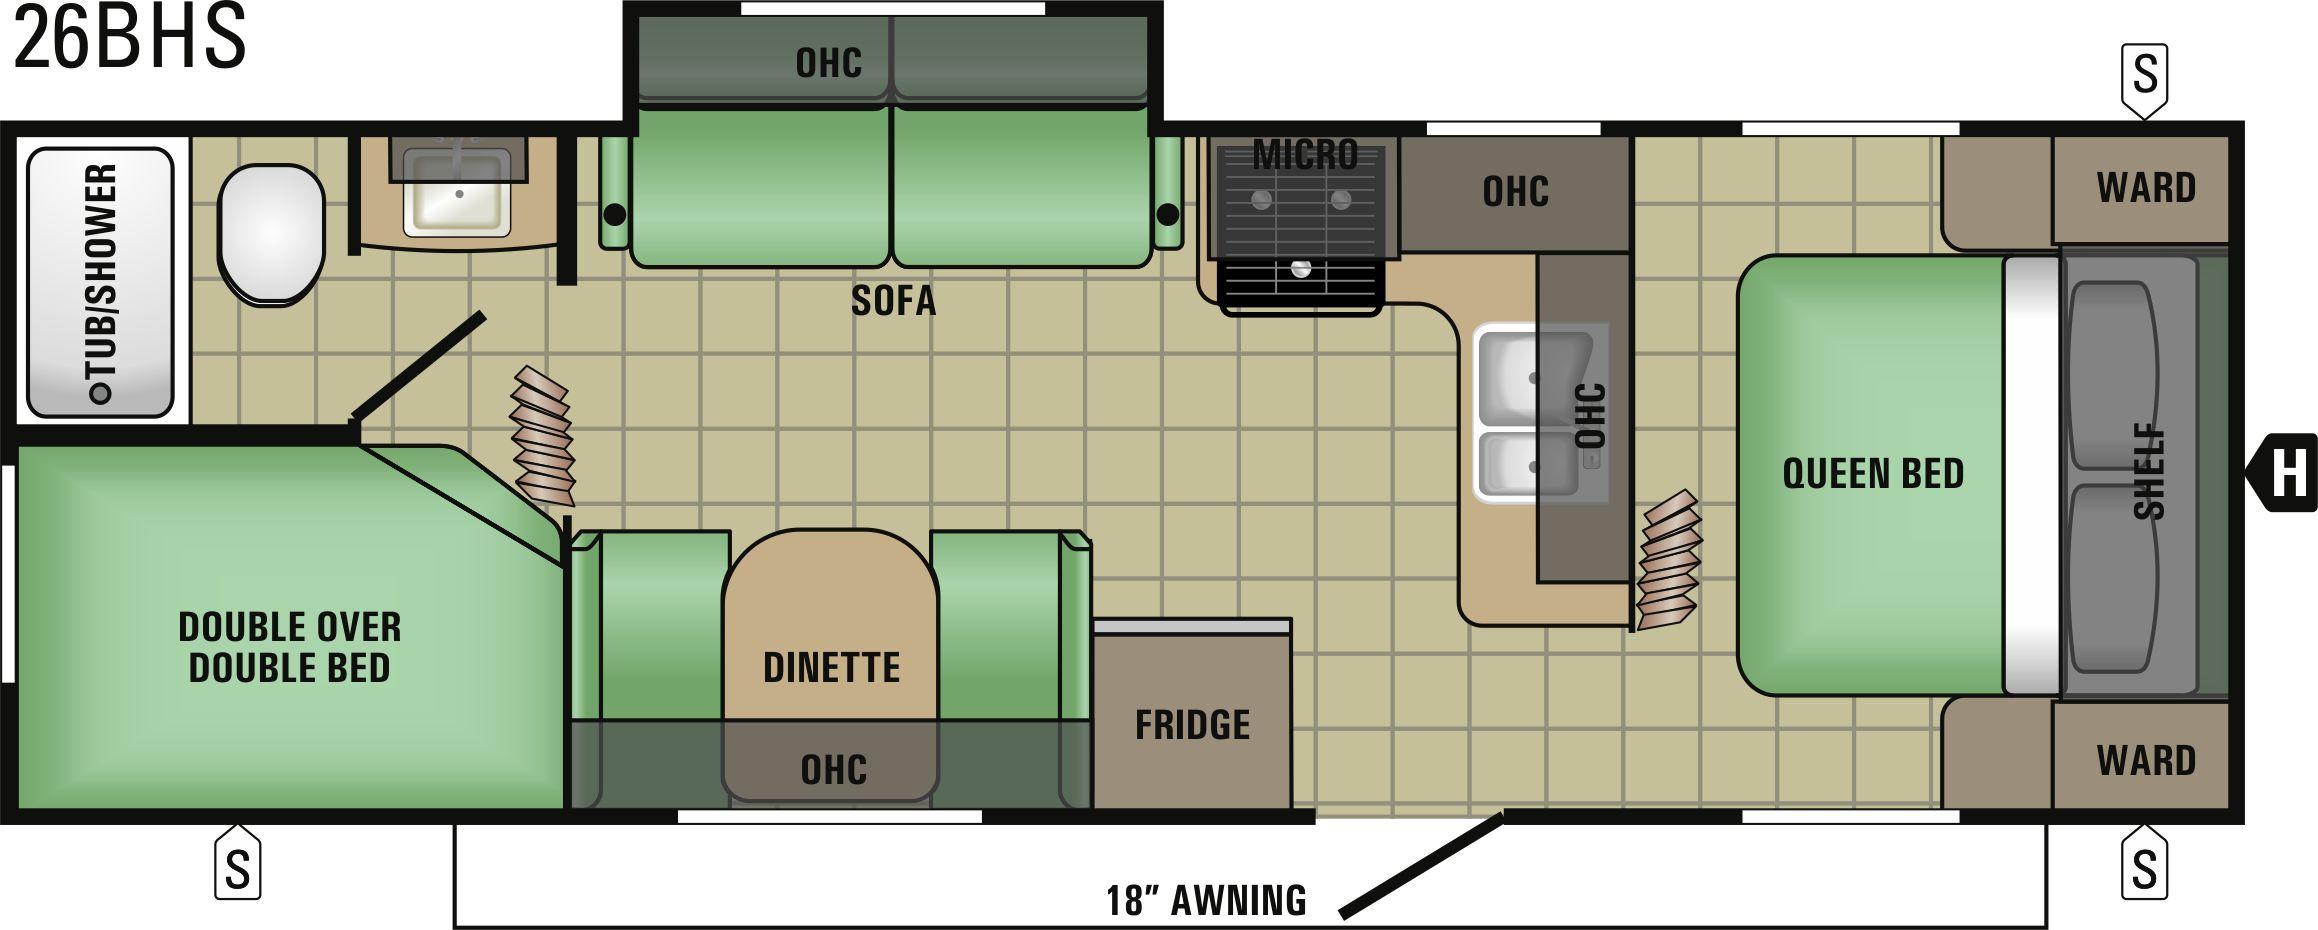 26BHS Floorplan